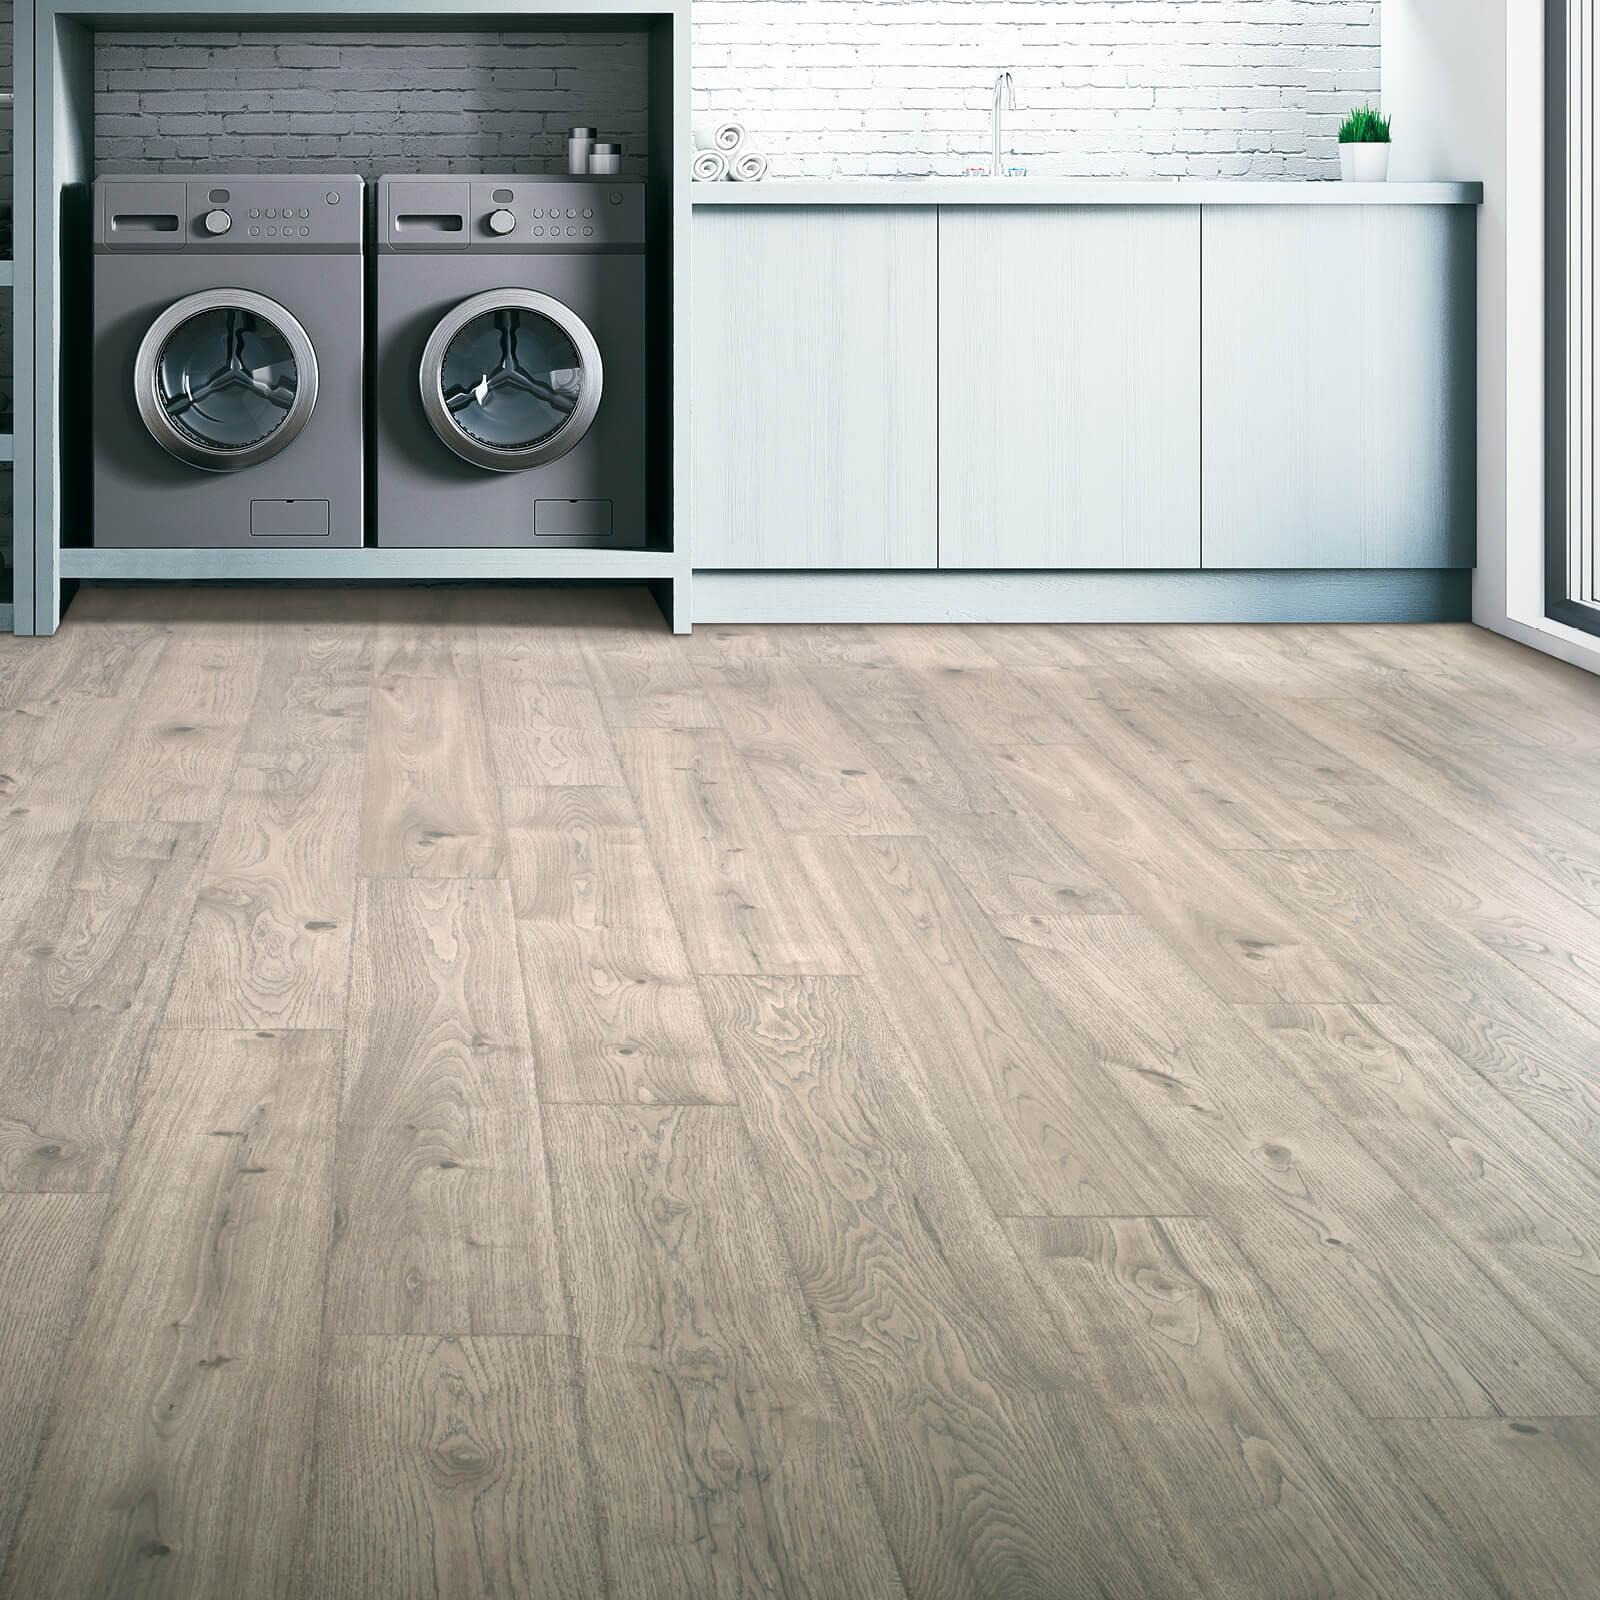 Laminate in Laundry Room | Haley's Flooring & Interiors